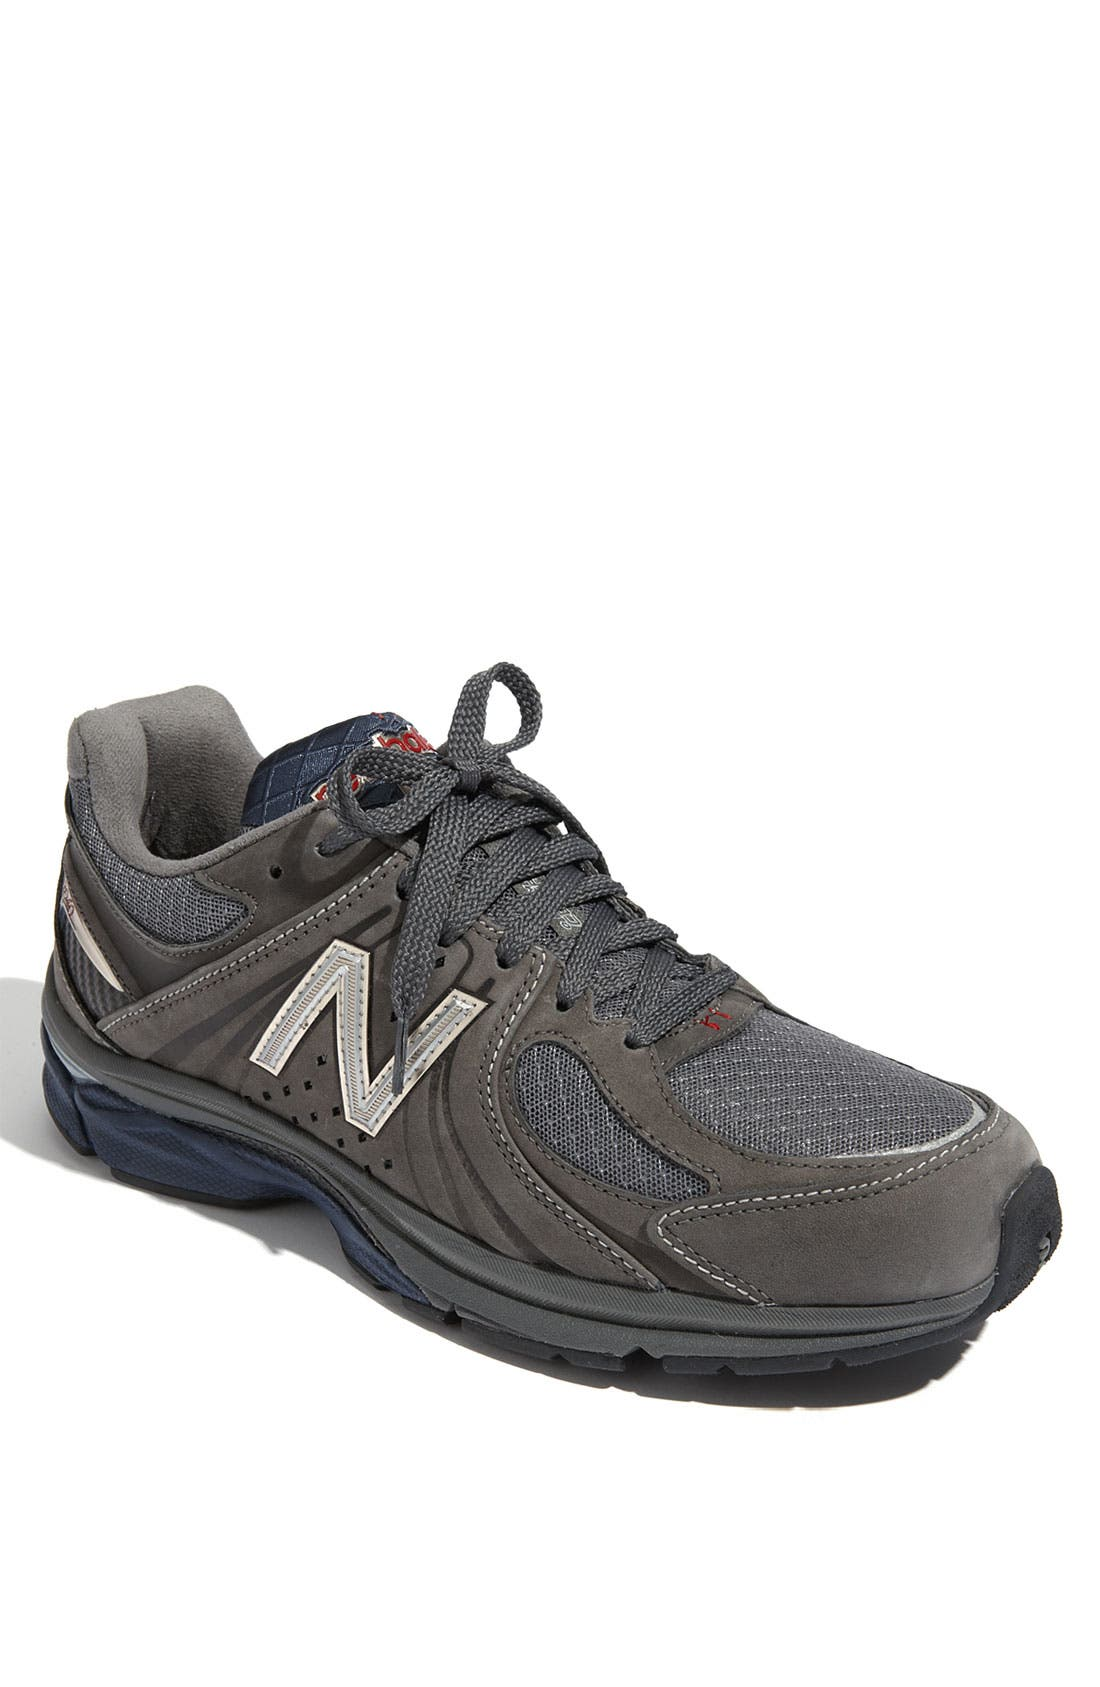 Alternate Image 1 Selected - New Balance 'Heritage Collection - 2040' Running Shoe (Men)